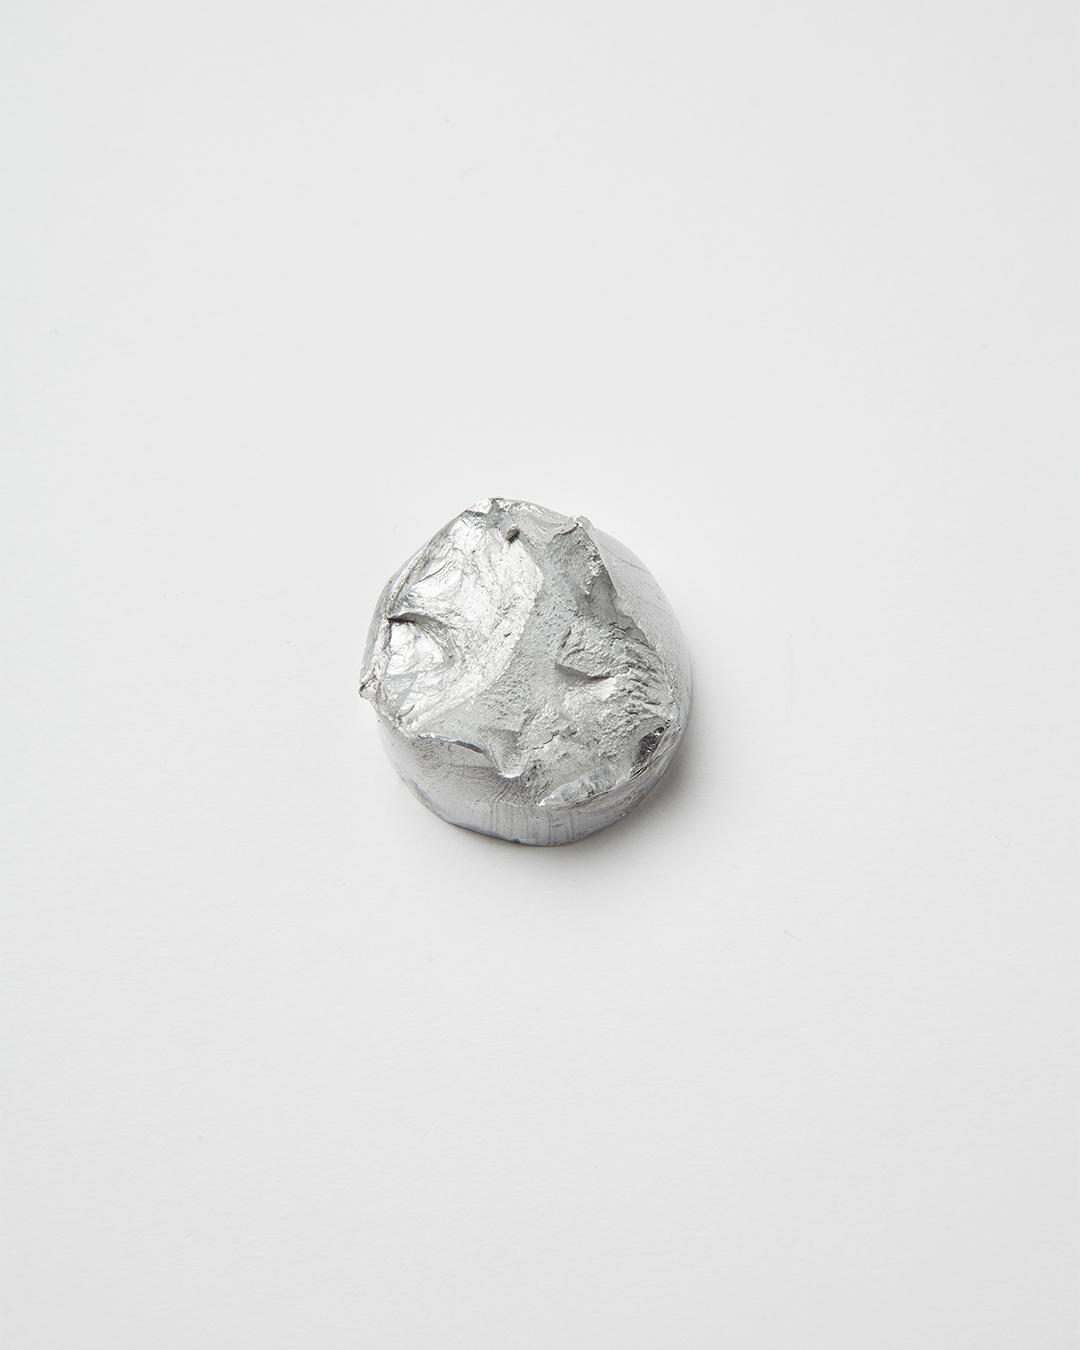 Barbara Schrobenhauser, Ember, 2014, brooch; aluminium, stainless steel ø 35 mm, H 25 mm, €620